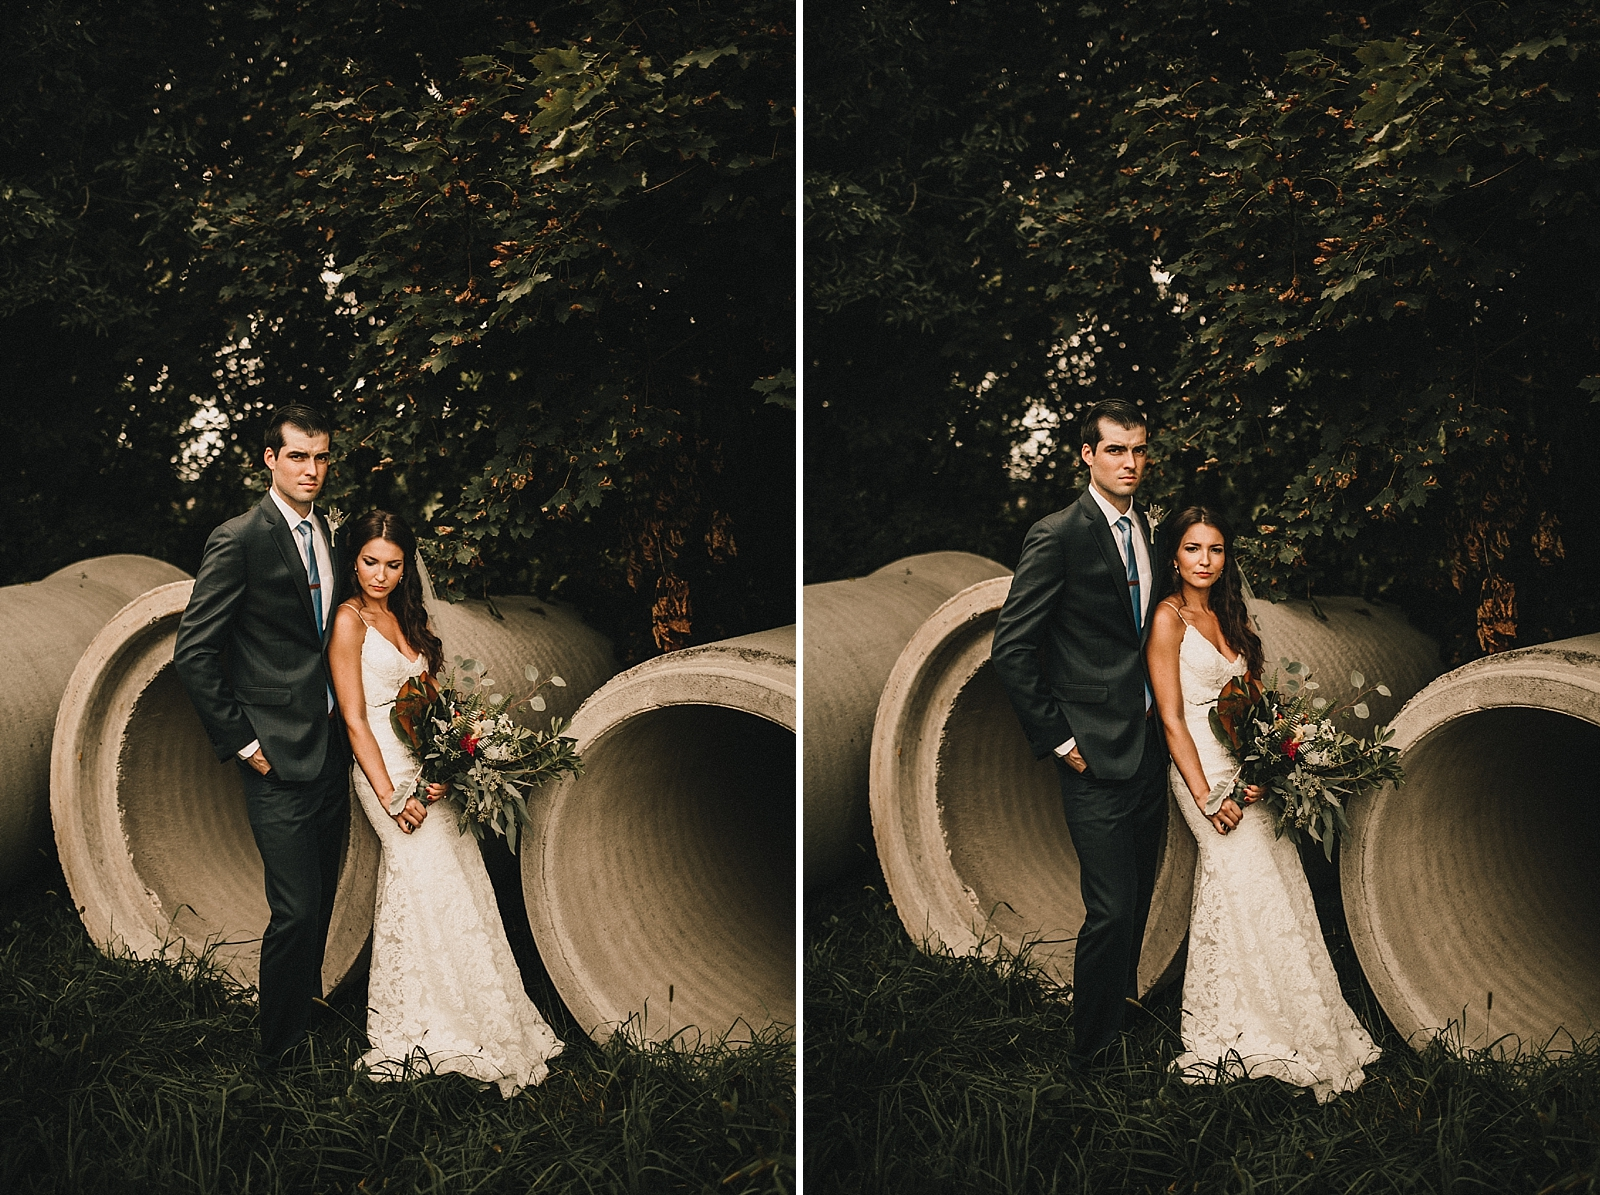 Brielle&Rob-TanaHelenePhotography-183_WEB.jpg